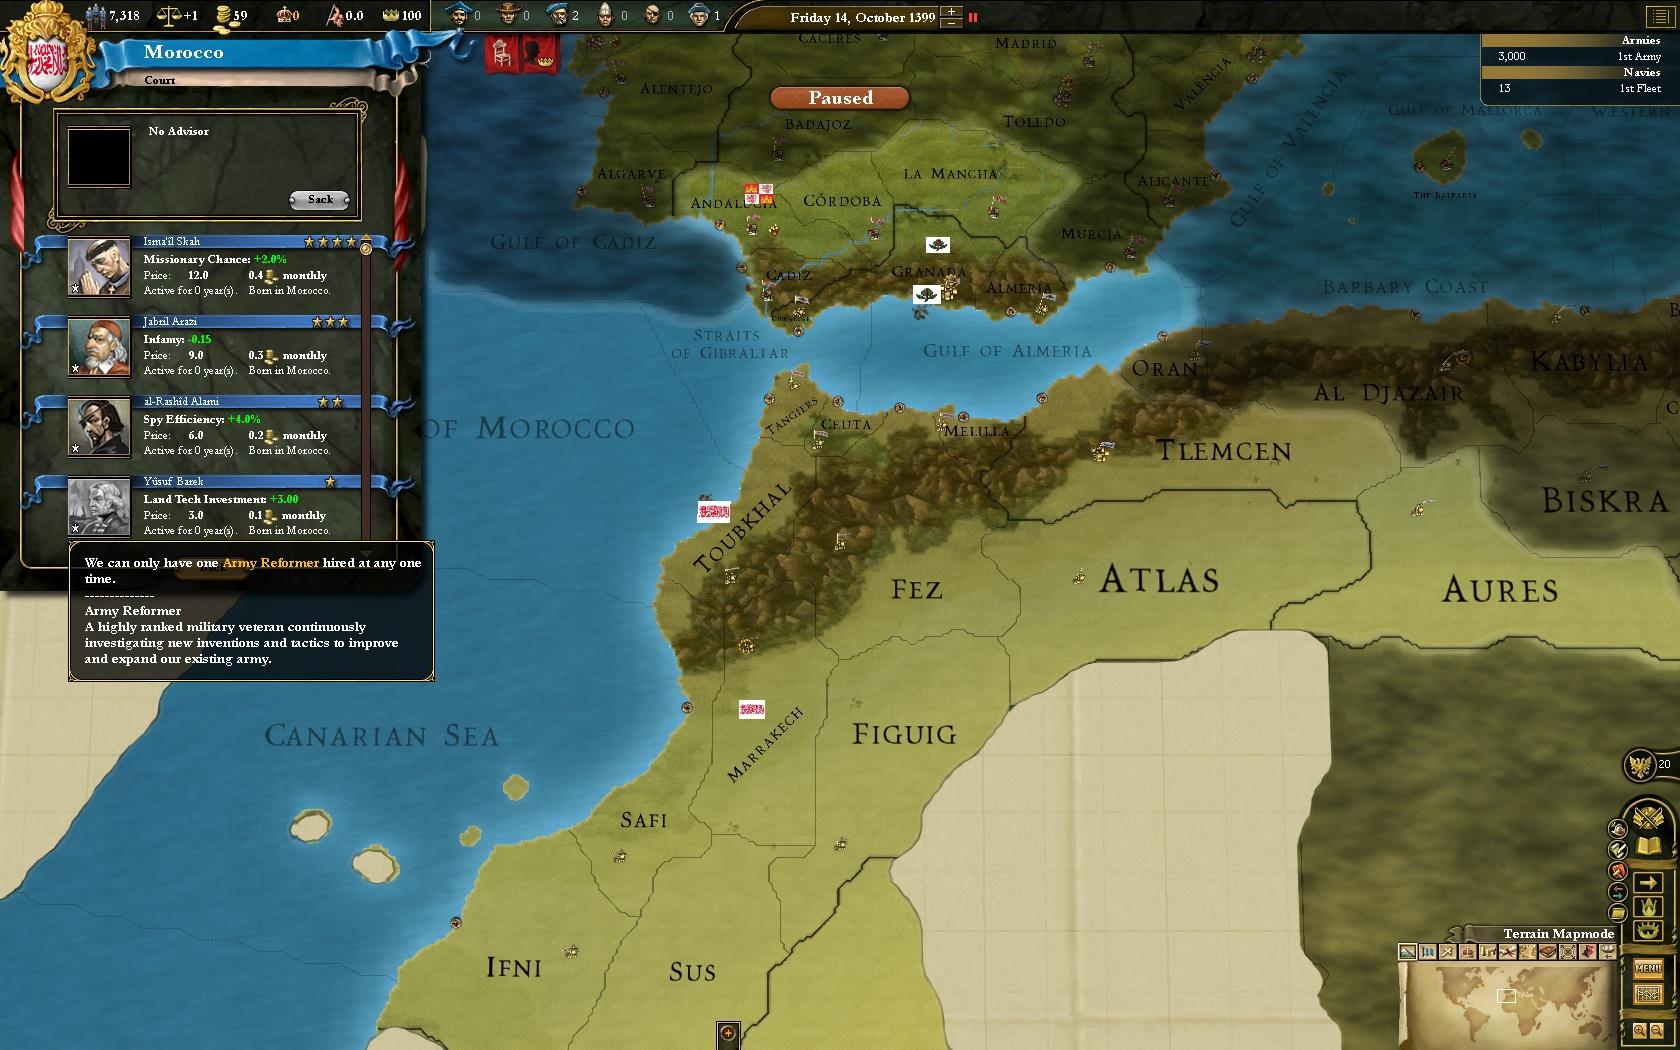 Europa Universalis III: Divine Wind screenshot